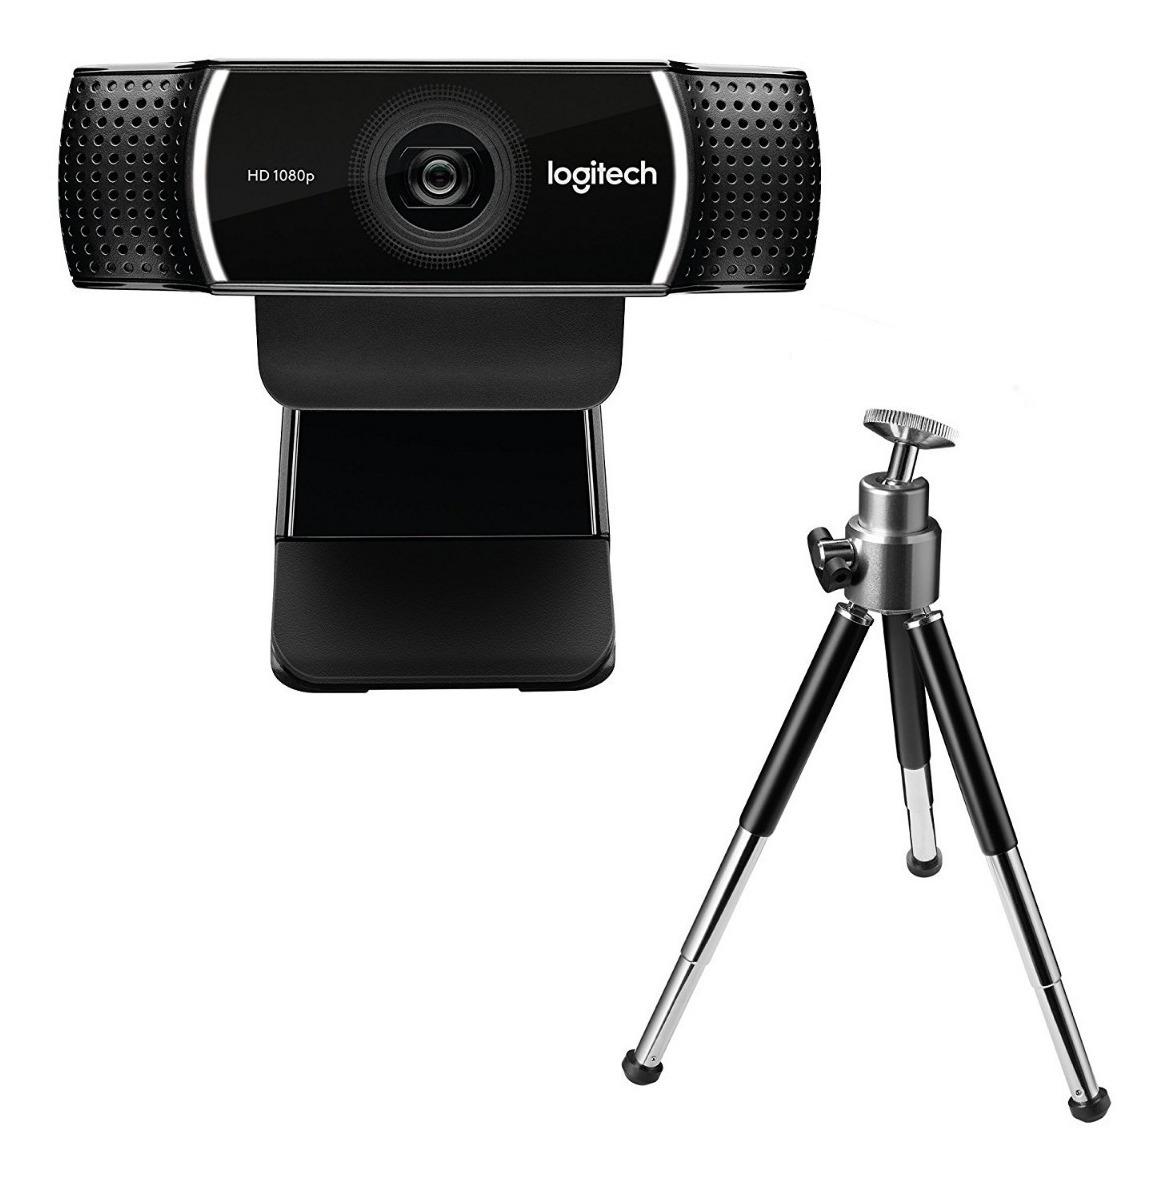 Camara Web Webcam Logitech C922 Pro Stream Full Hd +q C920